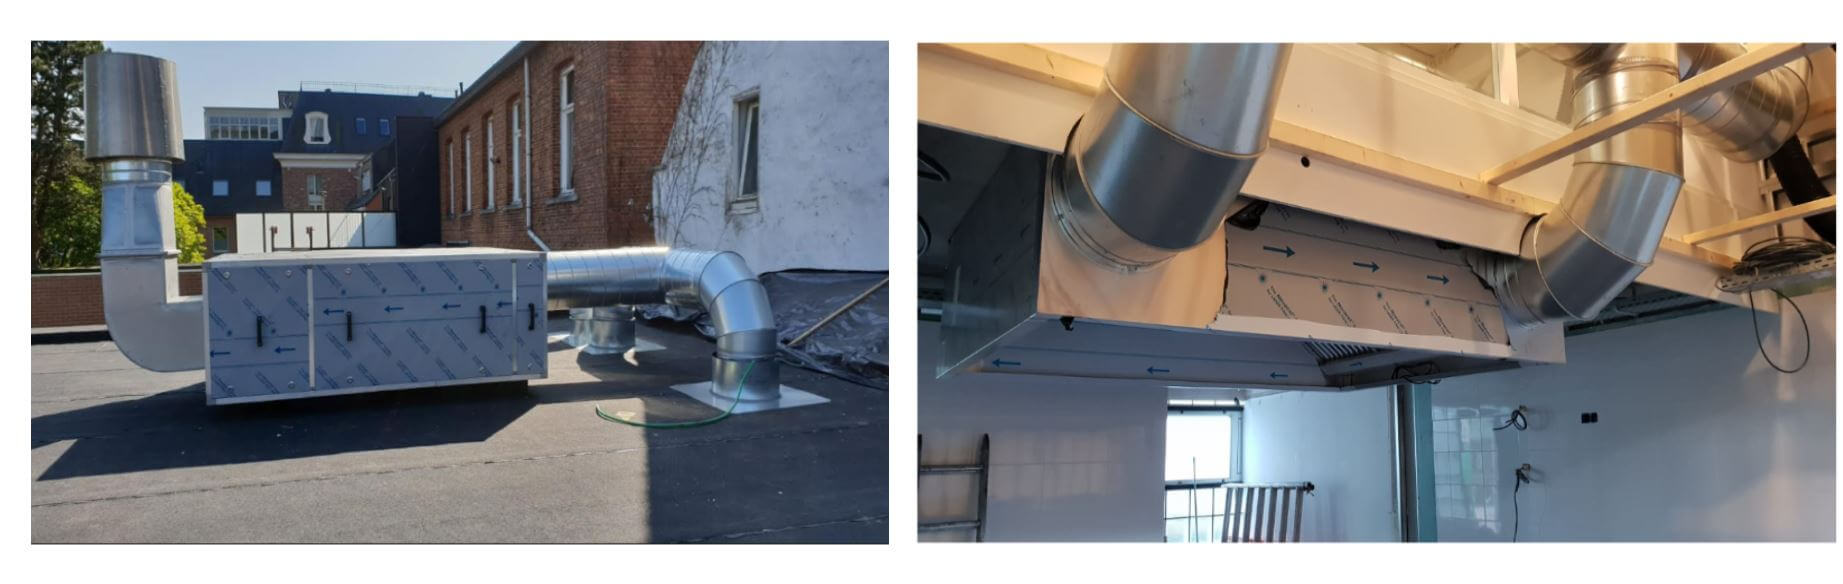 Installatie horeca afzuigkap en geurfilterkast